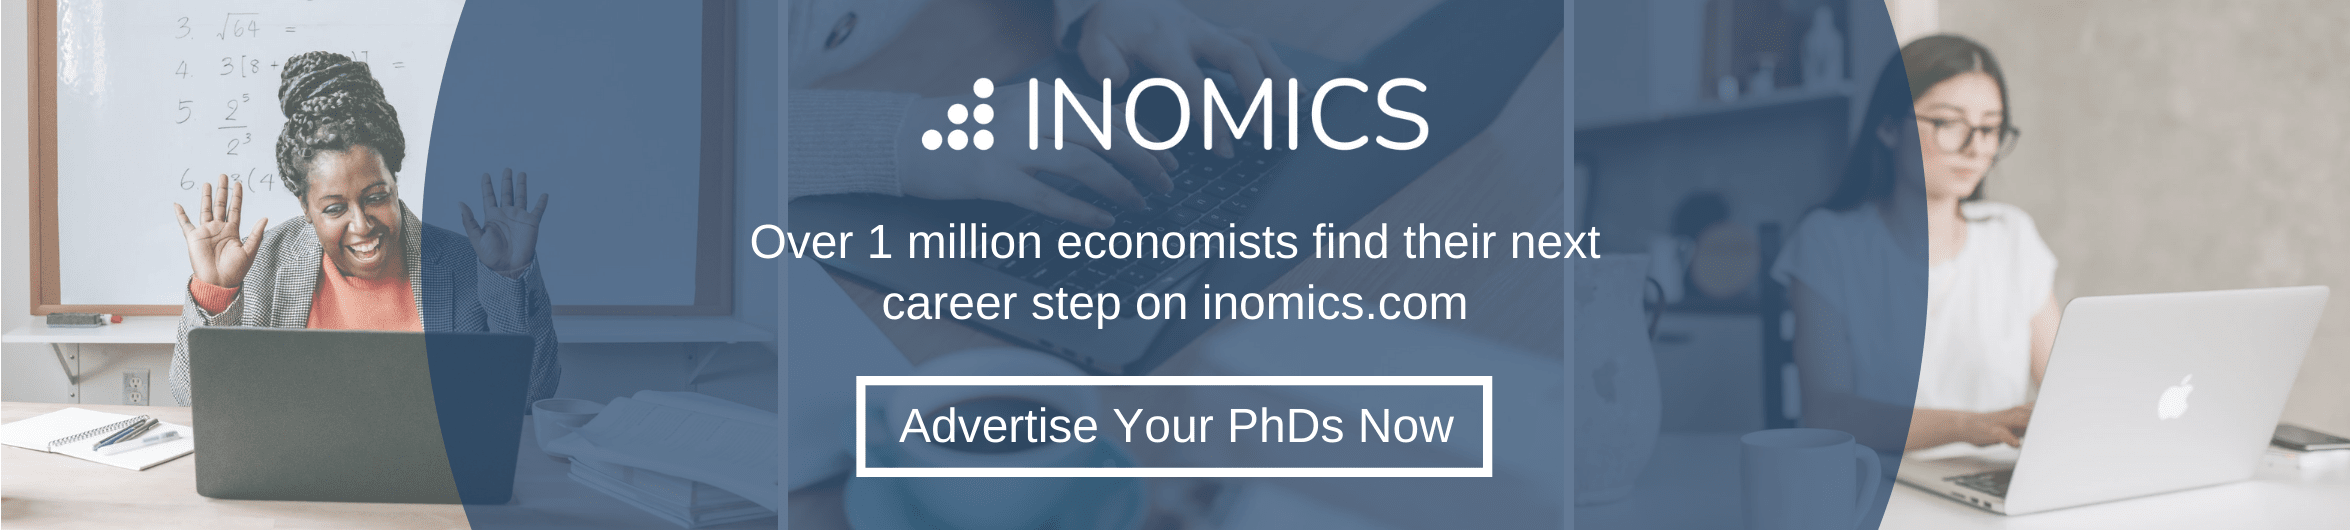 Advertise your PhD on inomics.com